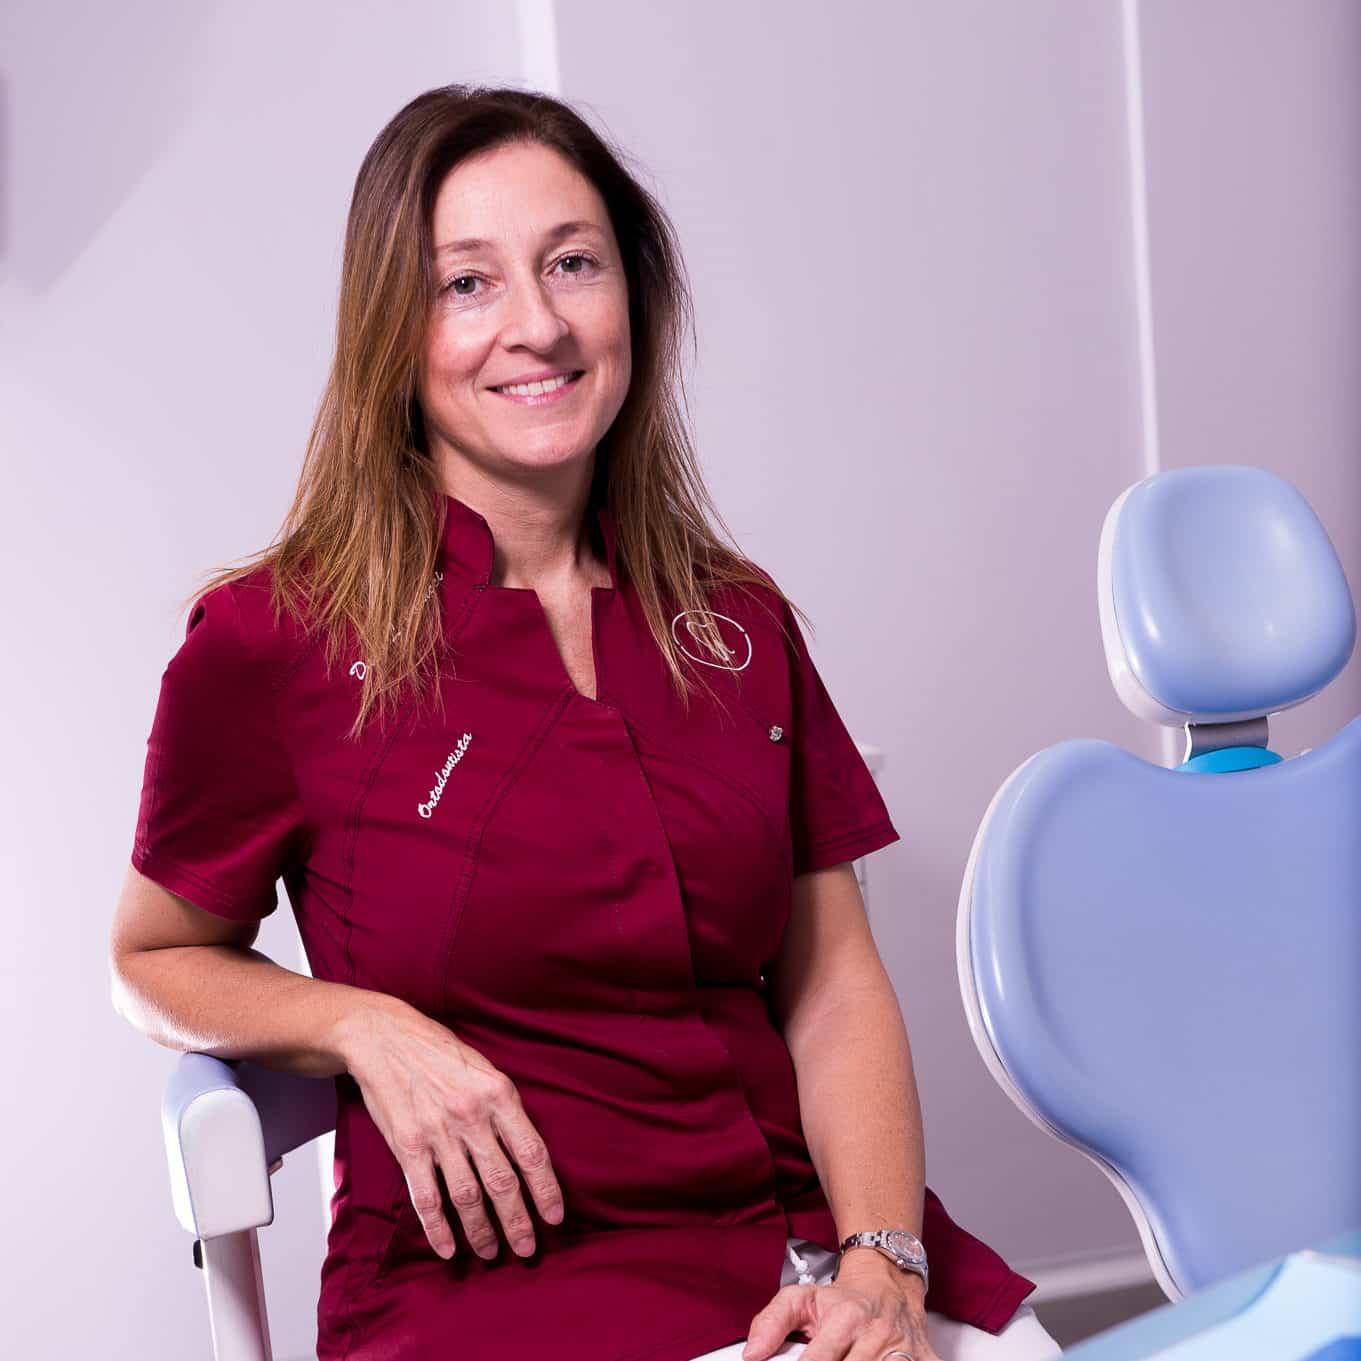 Dott.ssa Laura Cacucci